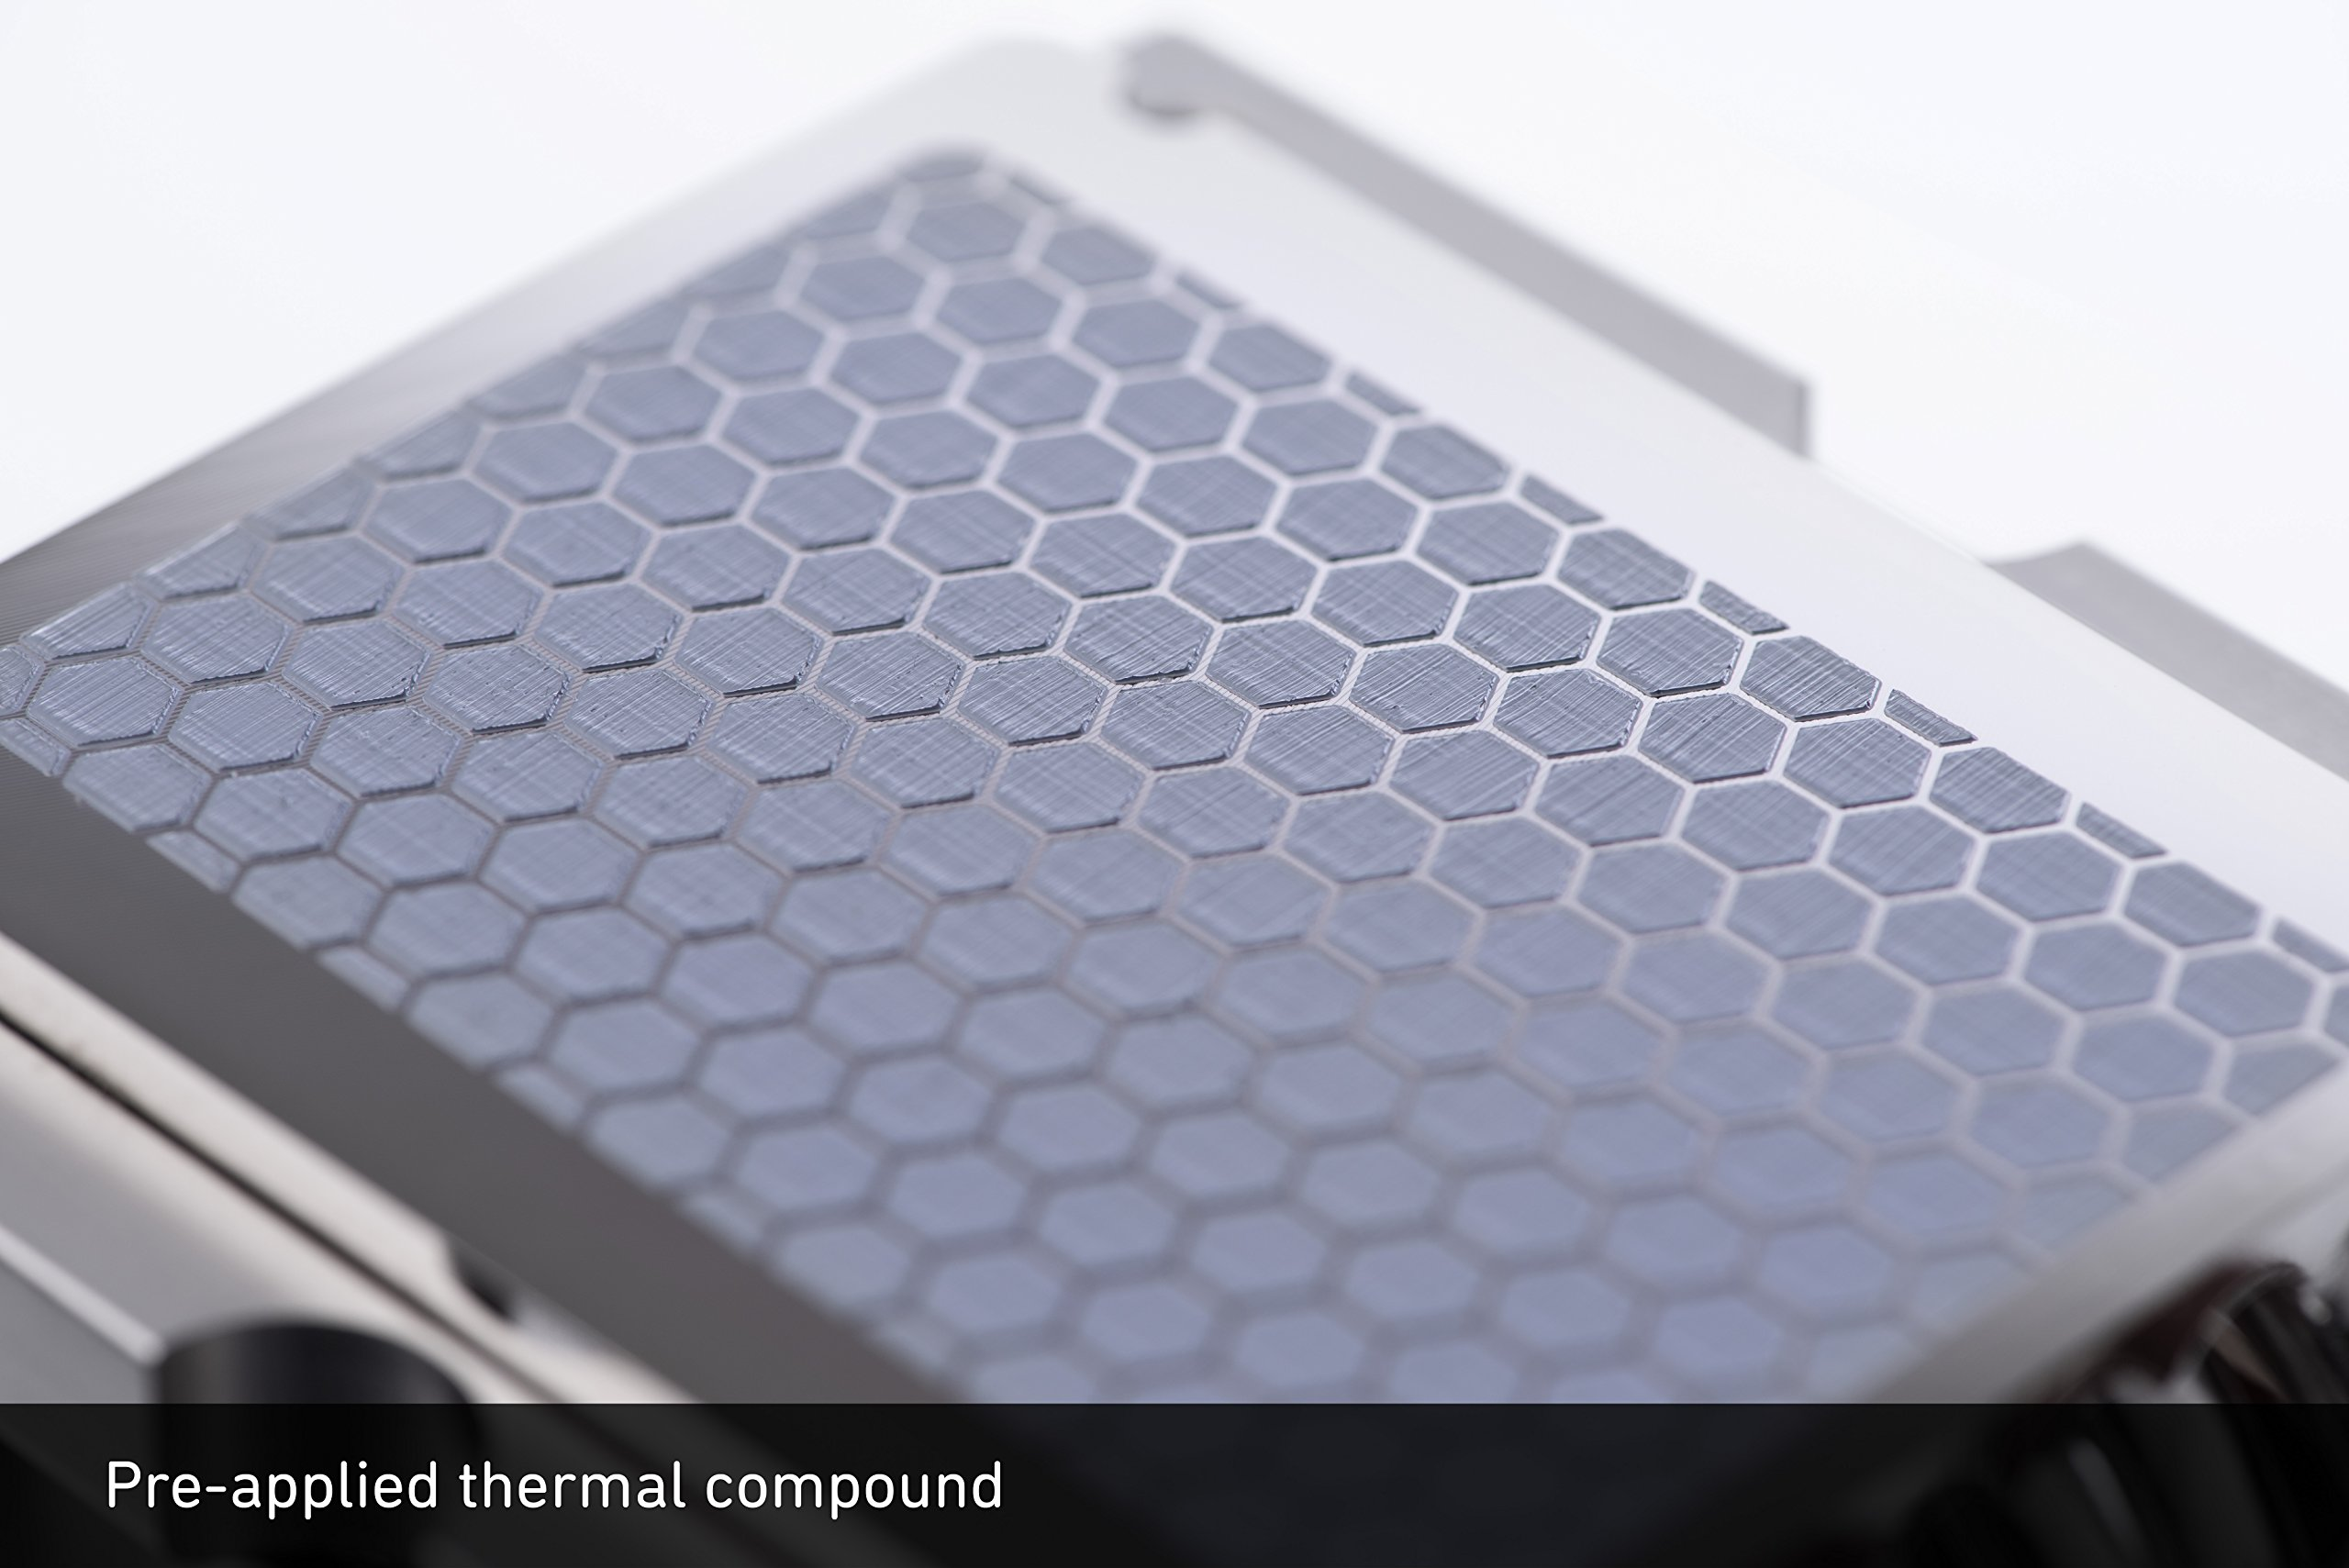 Noctua NH-U12S DX-3647 Premium Quality Quiet 120mm CPU Cooler for Intel Xeon LGA3647 by Noctua (Image #4)